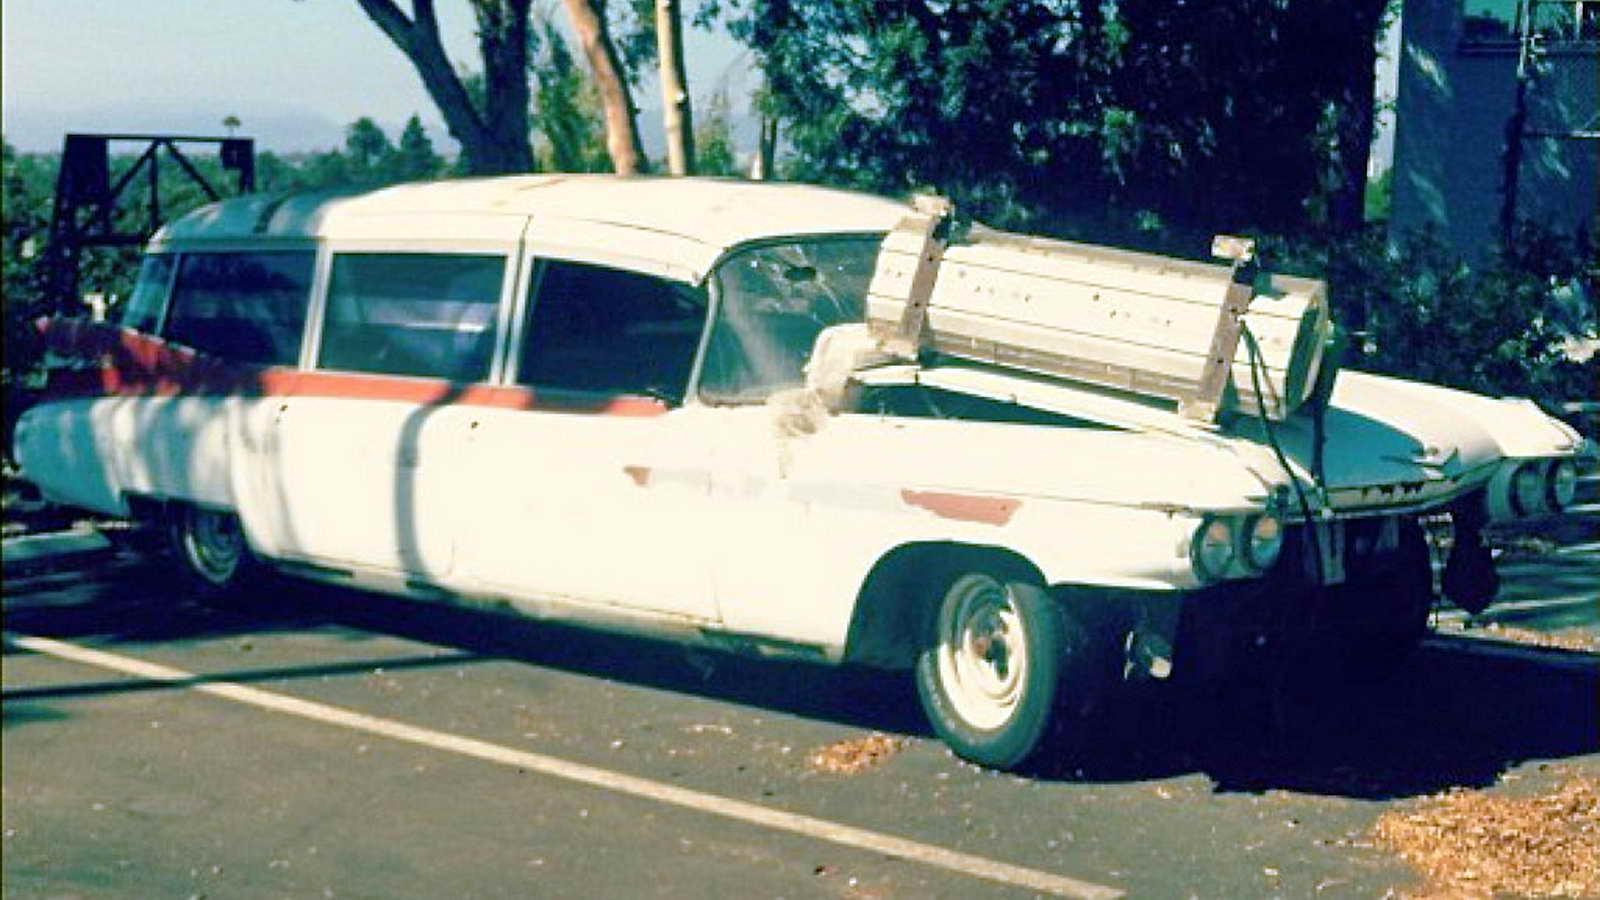 Cadillac_Ecto1a_Ghostbusters_II_02